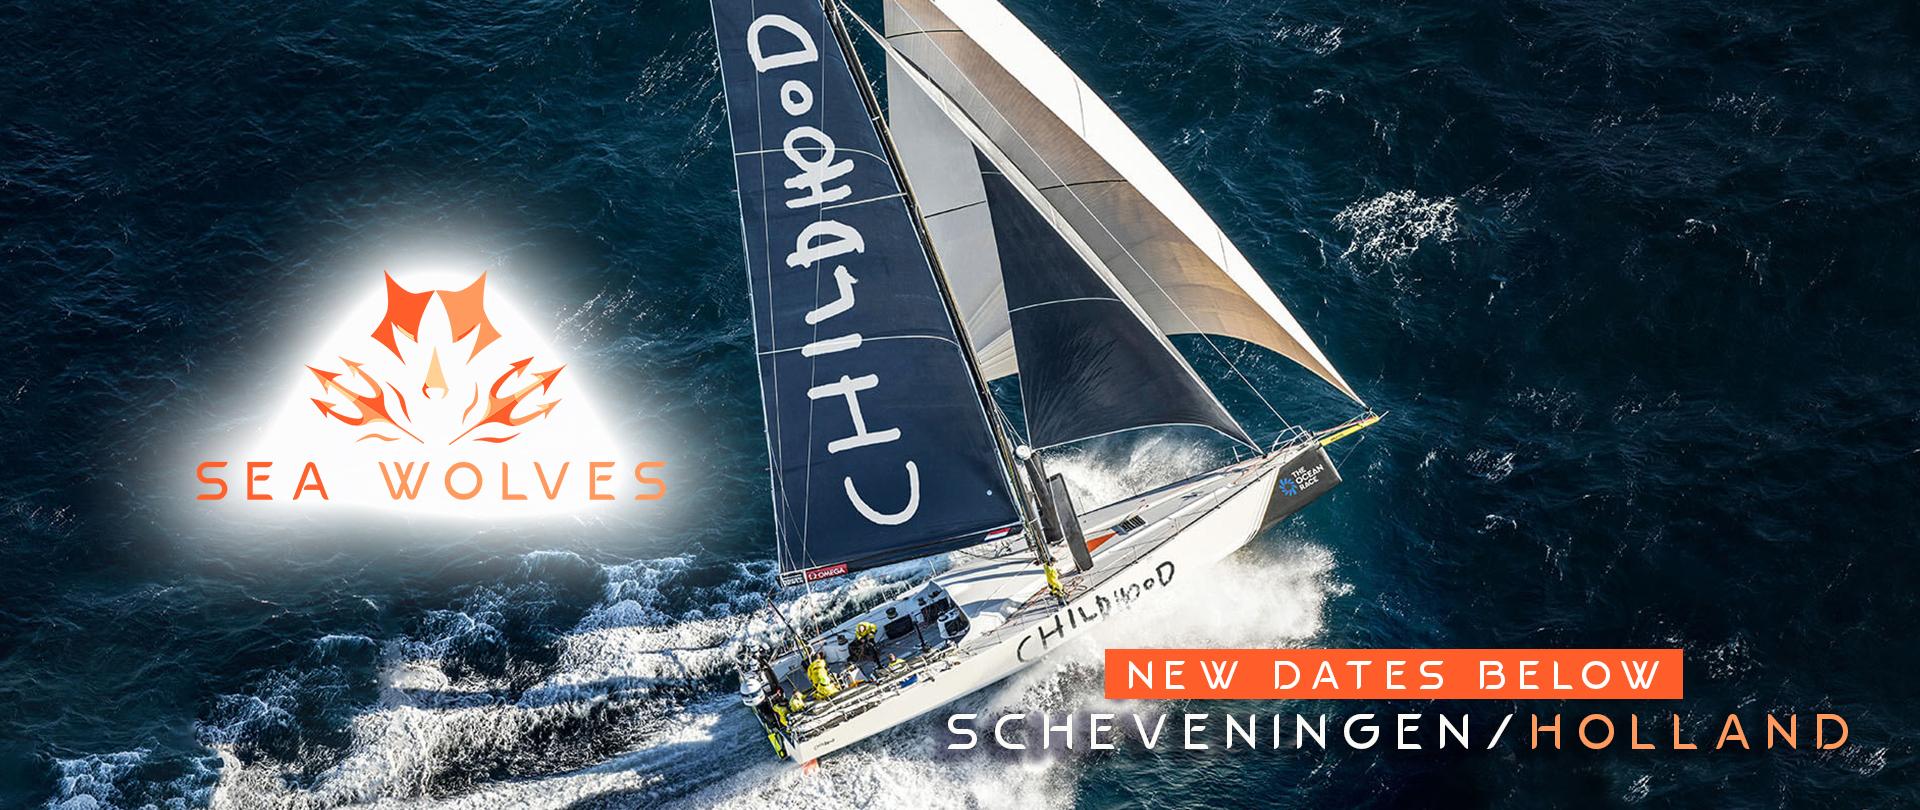 Sea Wolves Childhood v65 sailing clinics